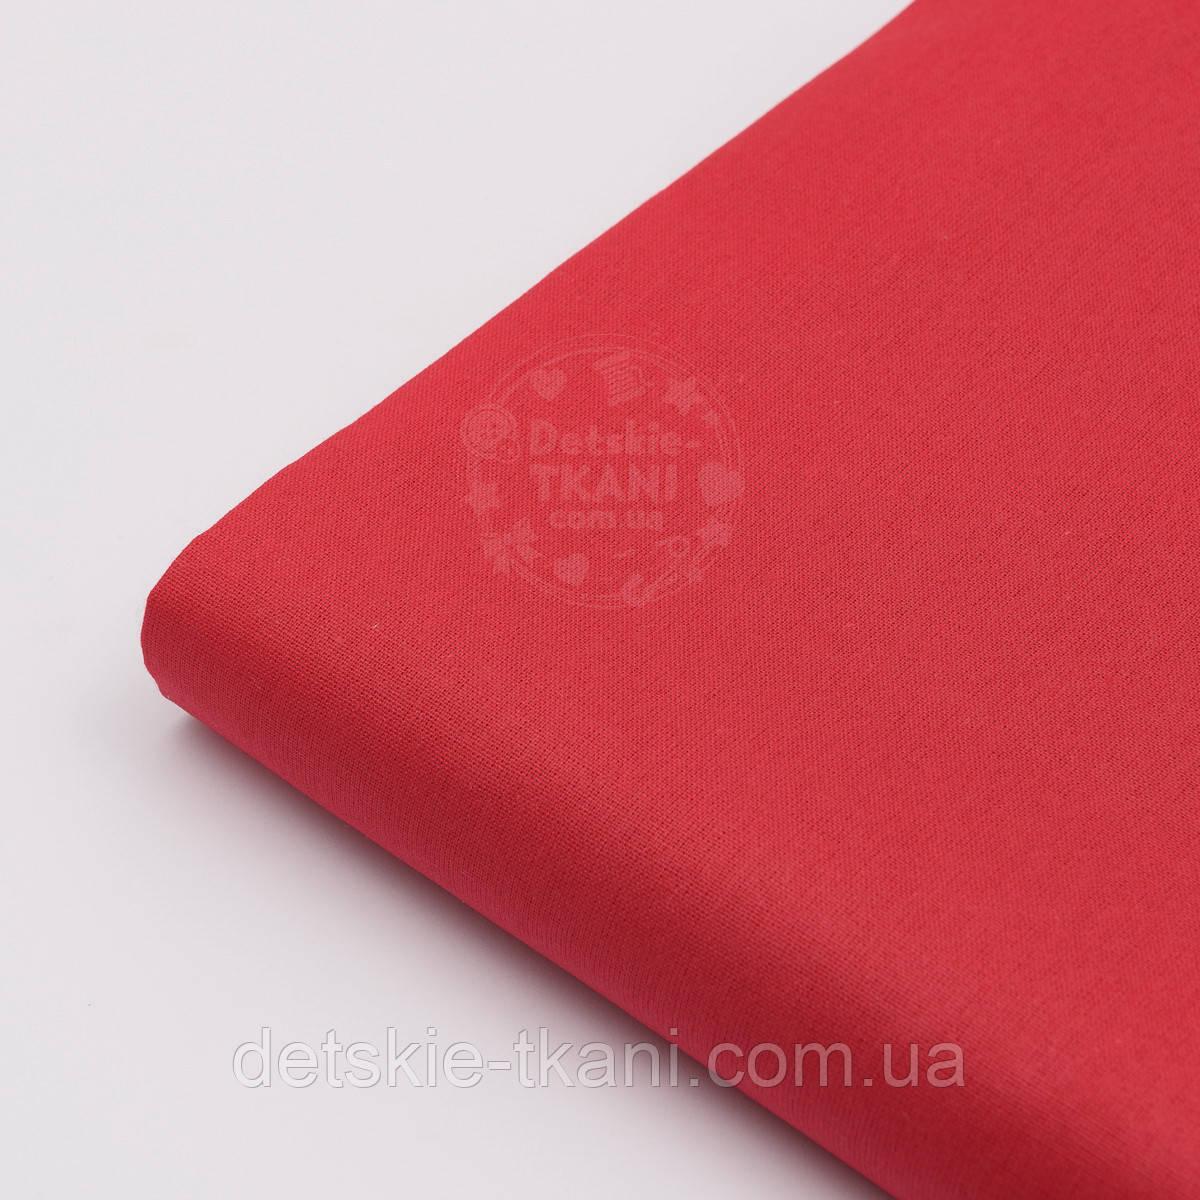 Лоскут ткани №330а  тёмно-красная однотонная, размер 15*160 см